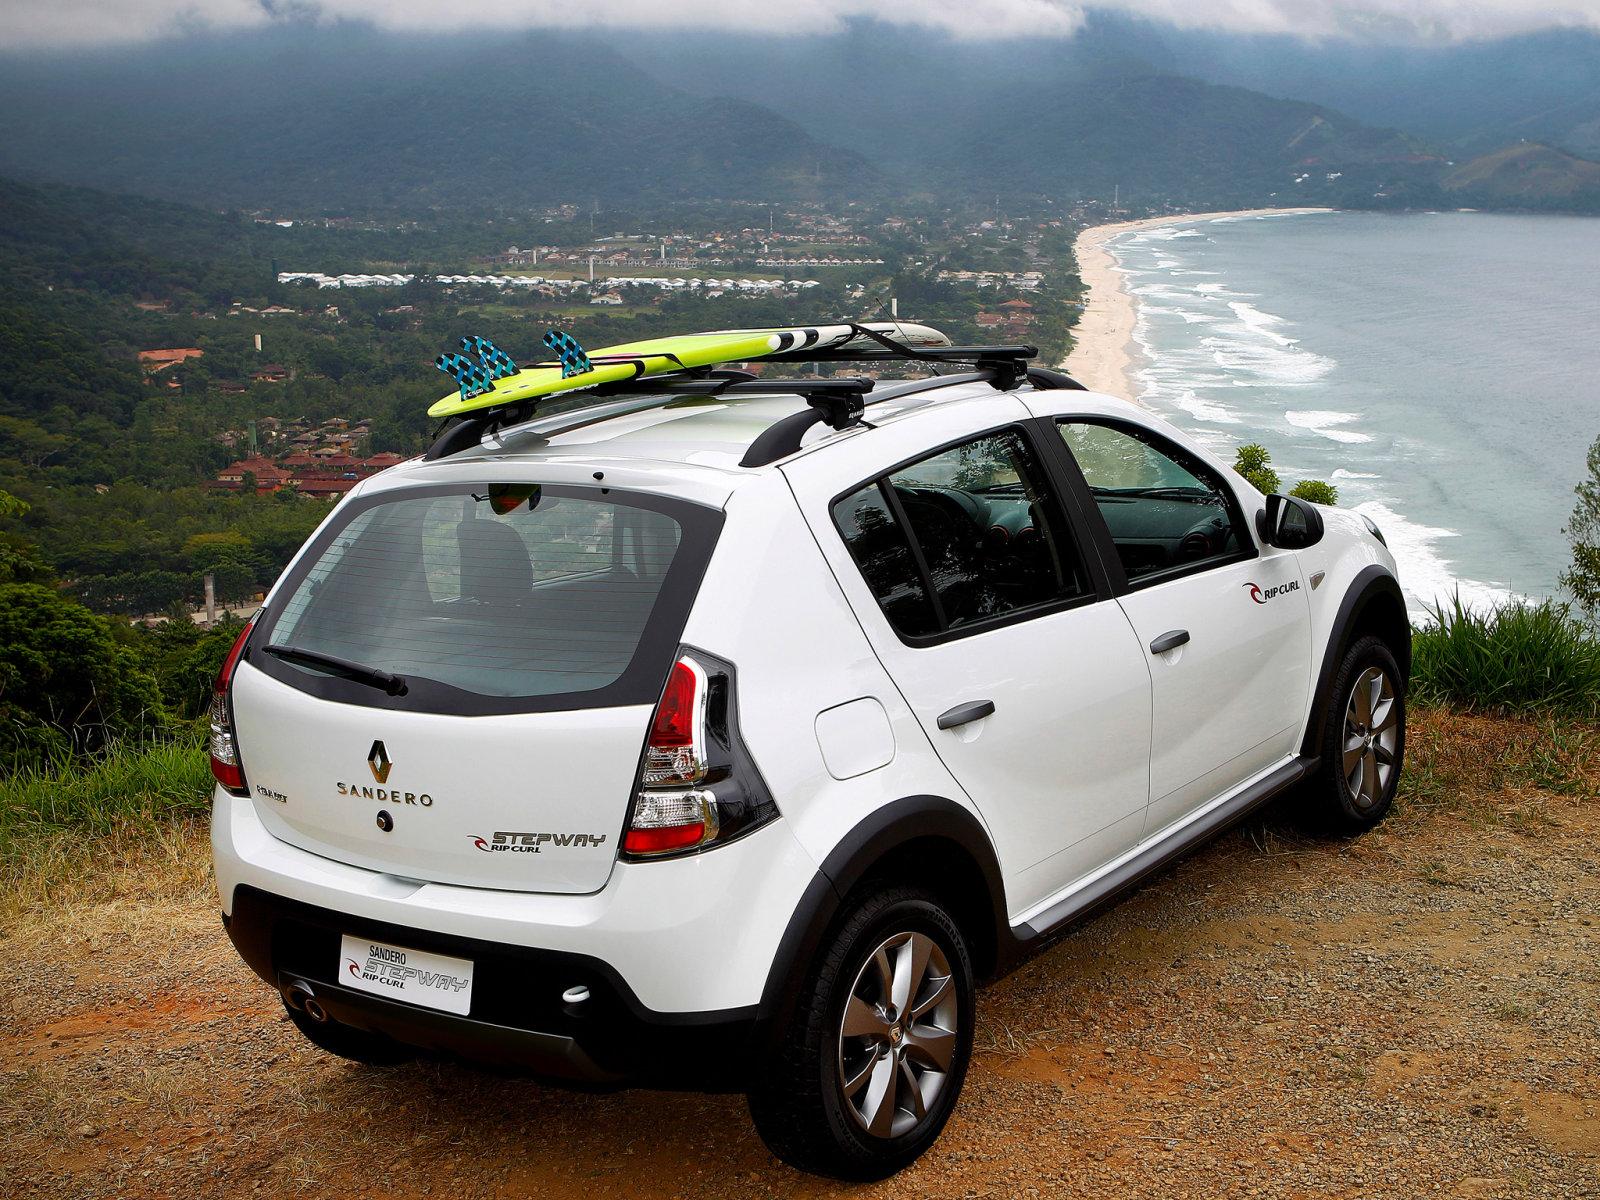 img7.autonavigator.ru/carsfoto/1600/11217/161280/Renault_Sandero%20Stepway_SUV%205%20door_2012.jpg